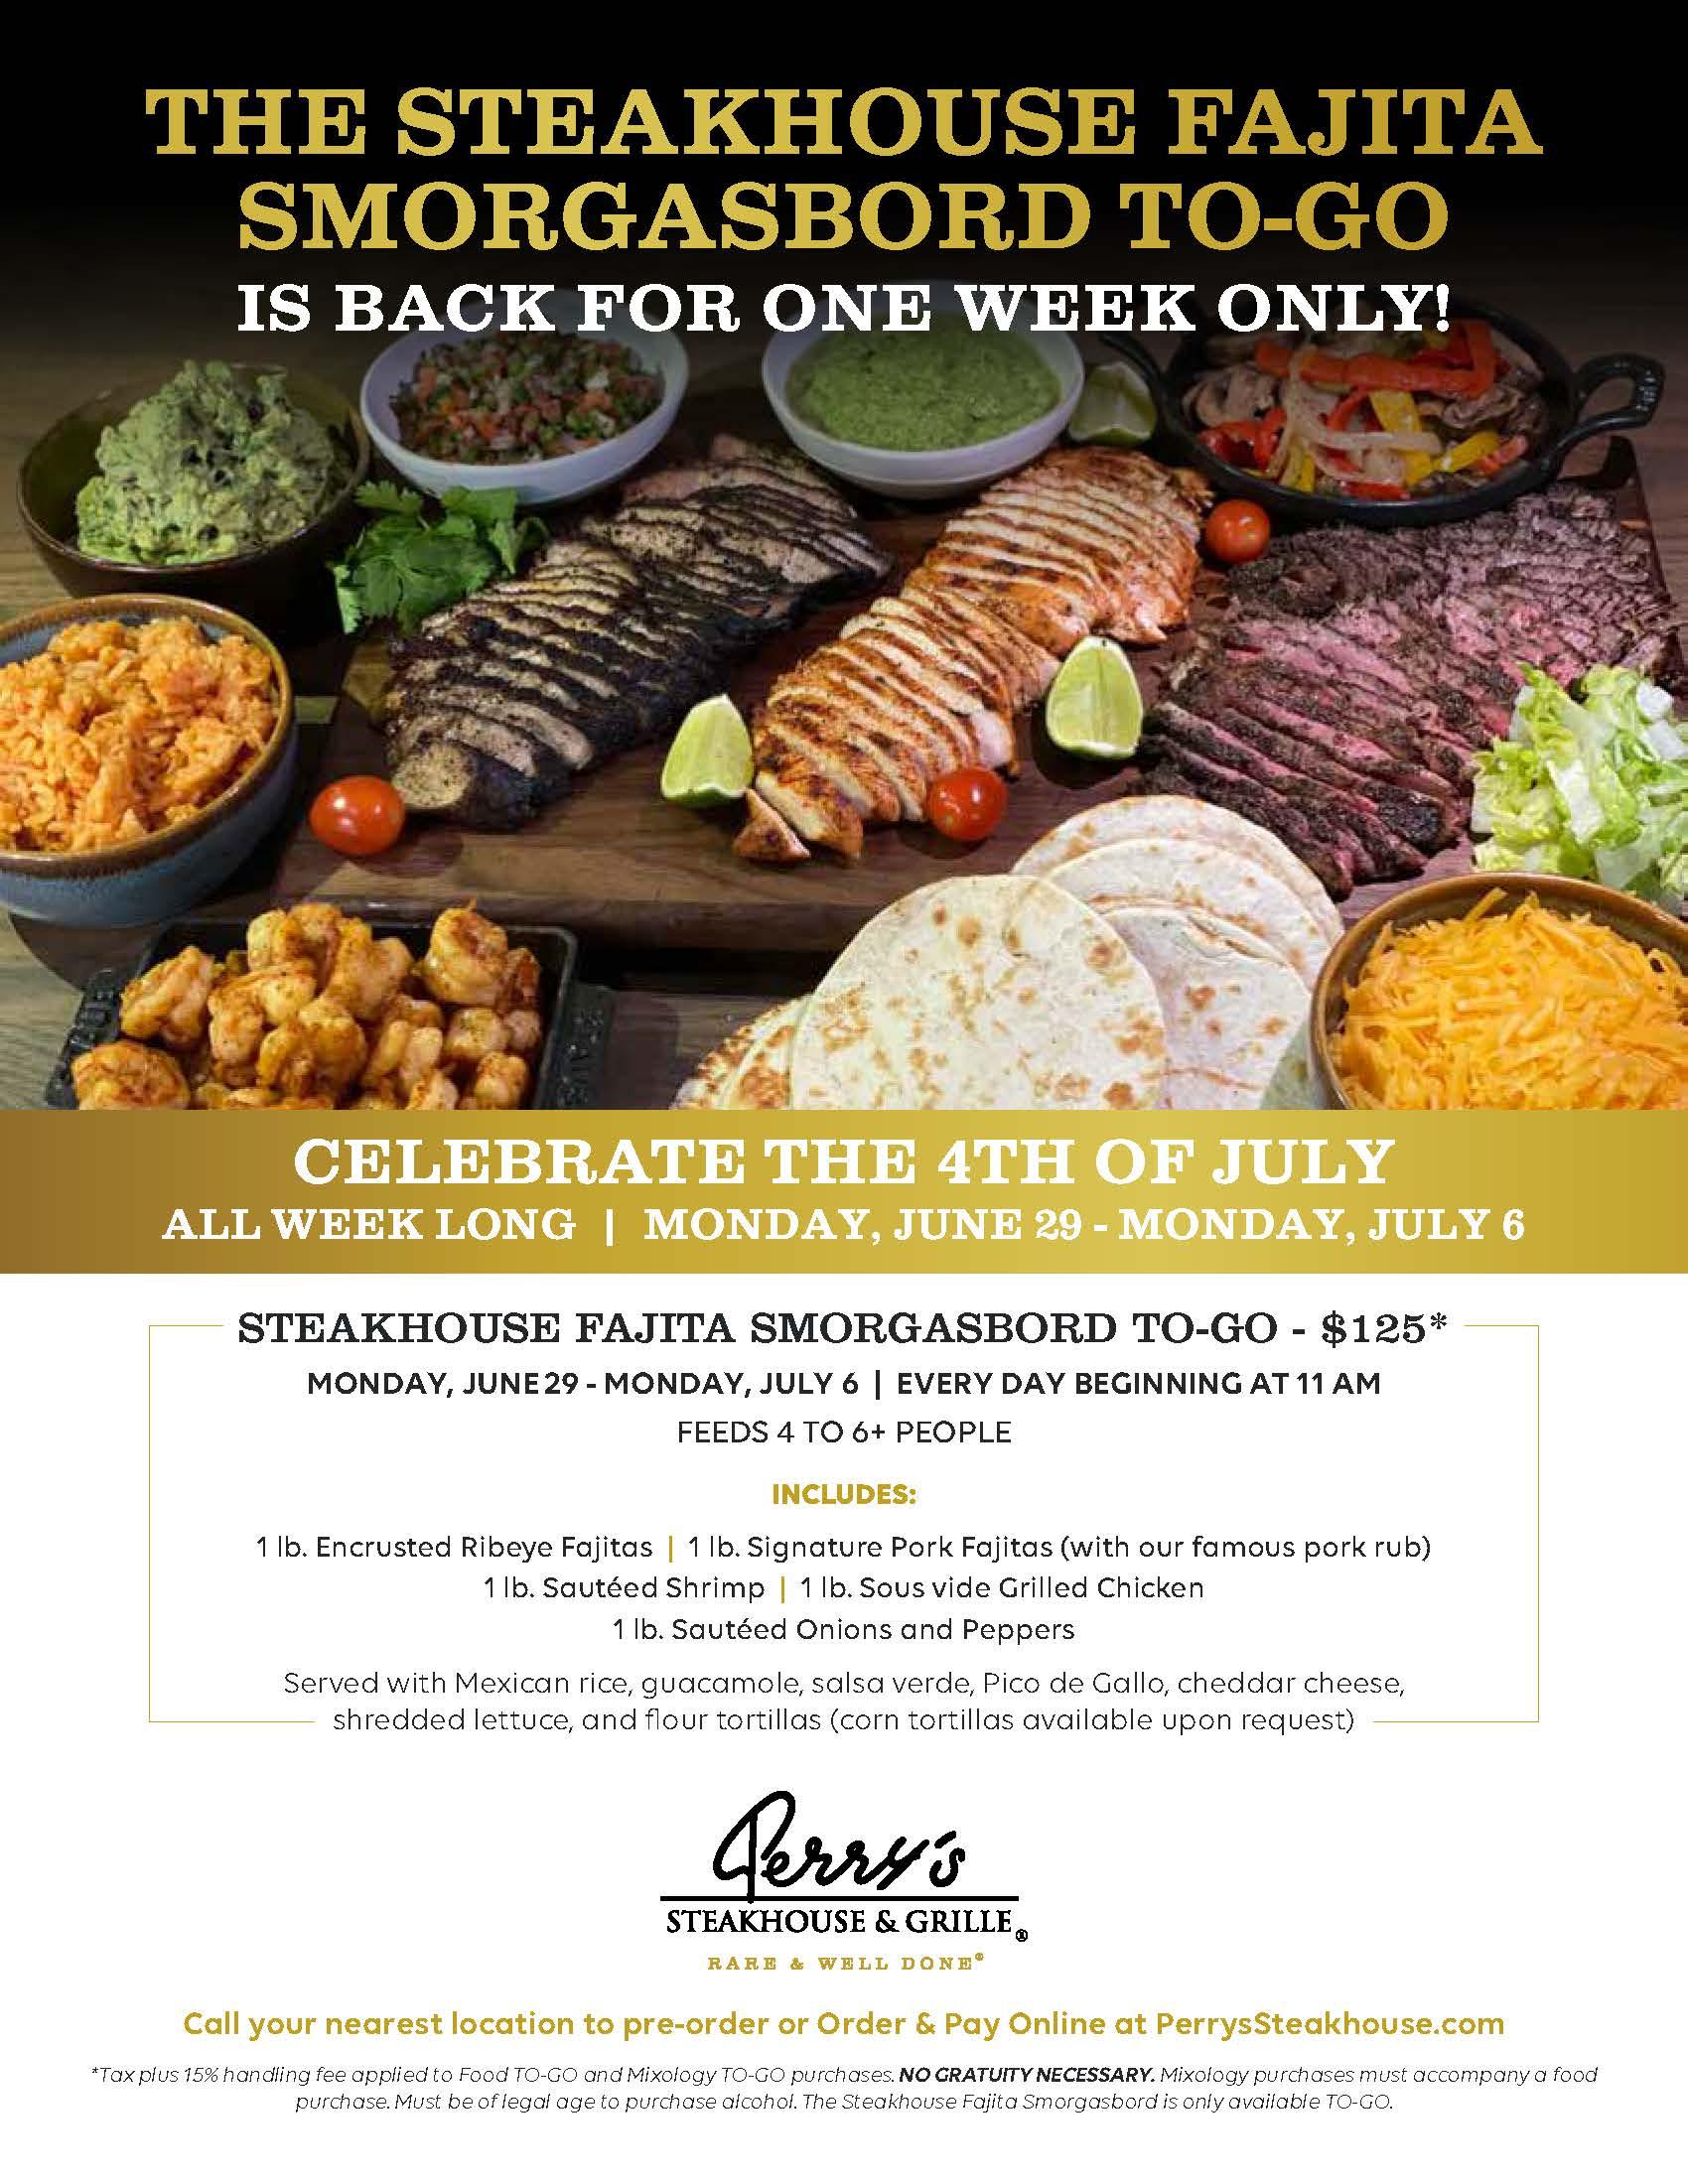 4th of July Fajita Smorgasboard